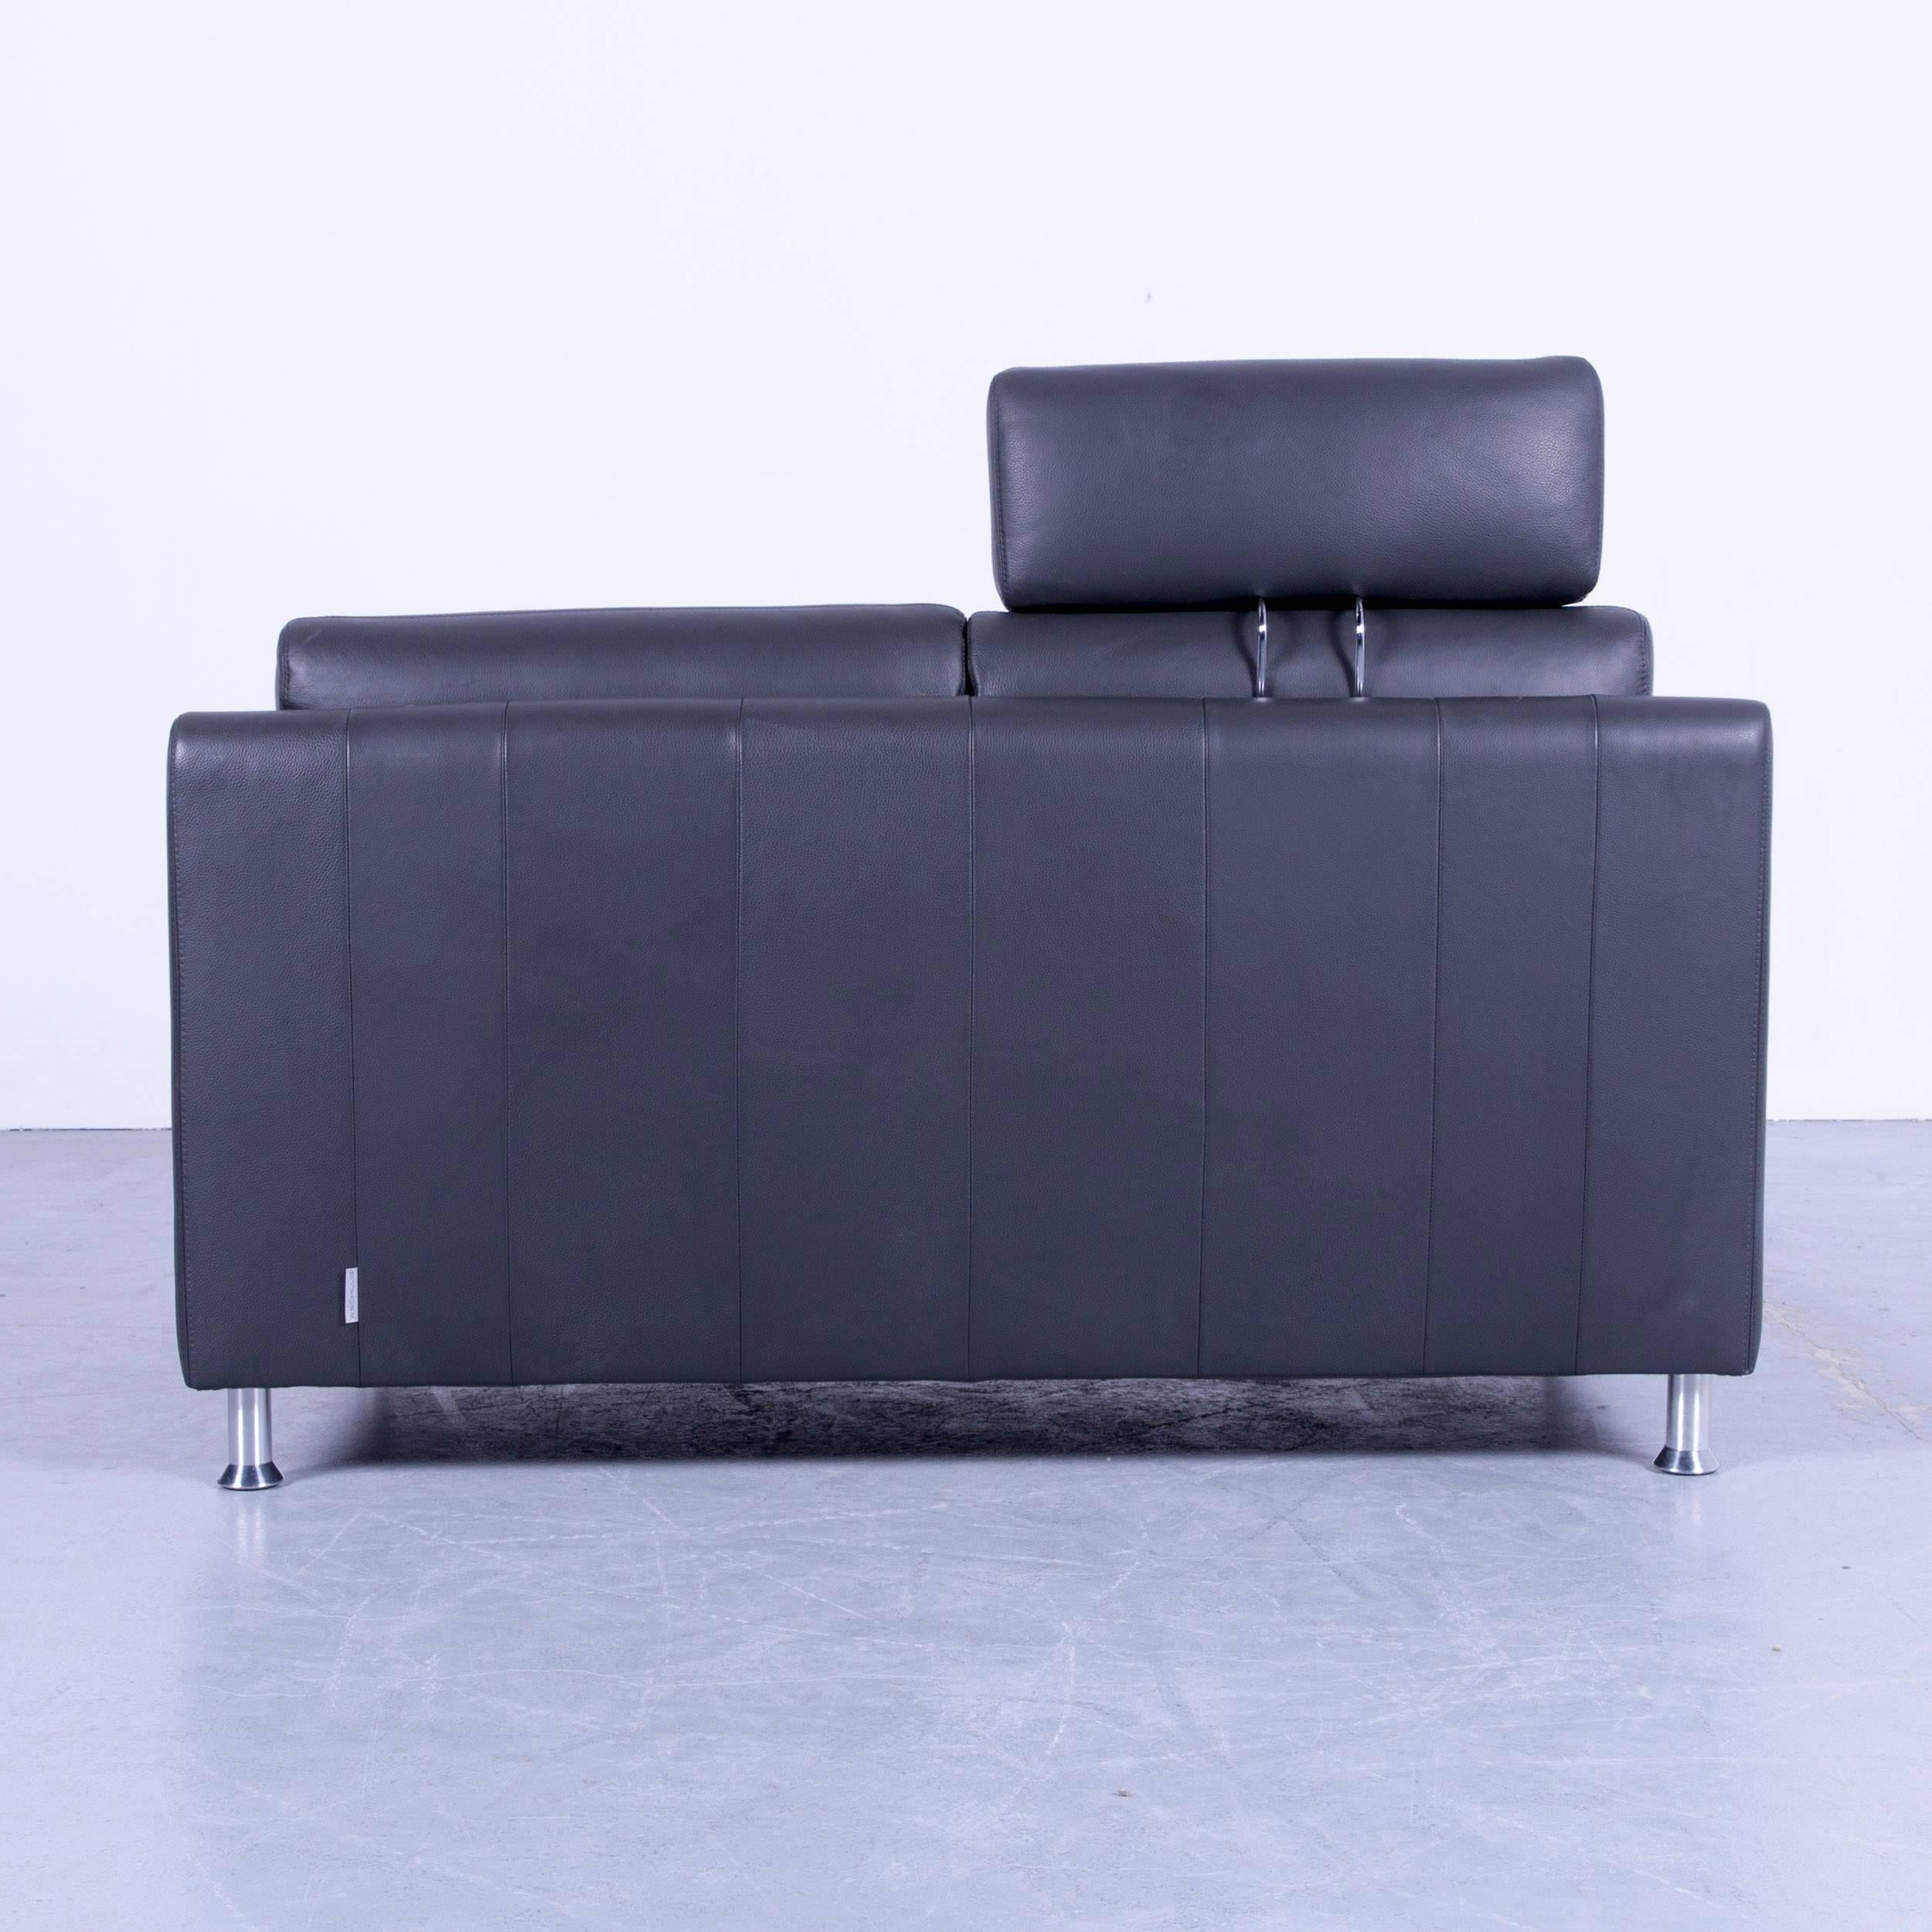 Sofa grau modern good gus modern adelaide sofa with sofa - Wohnideen wohnzimmer grau weiay ...